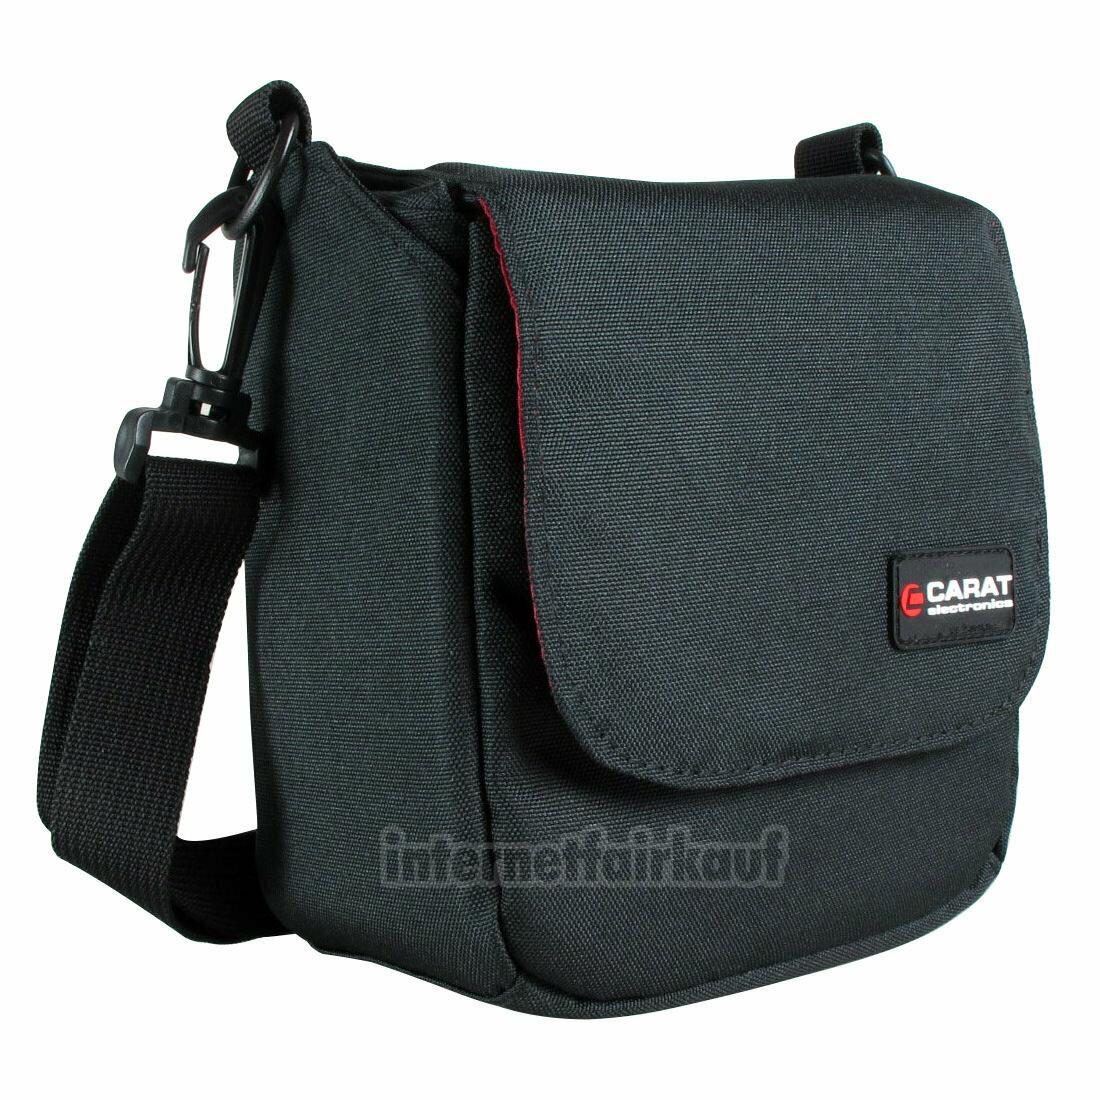 Fototasche passend für Sony Alpha A5000 A5100 A6000 - Schultertasche